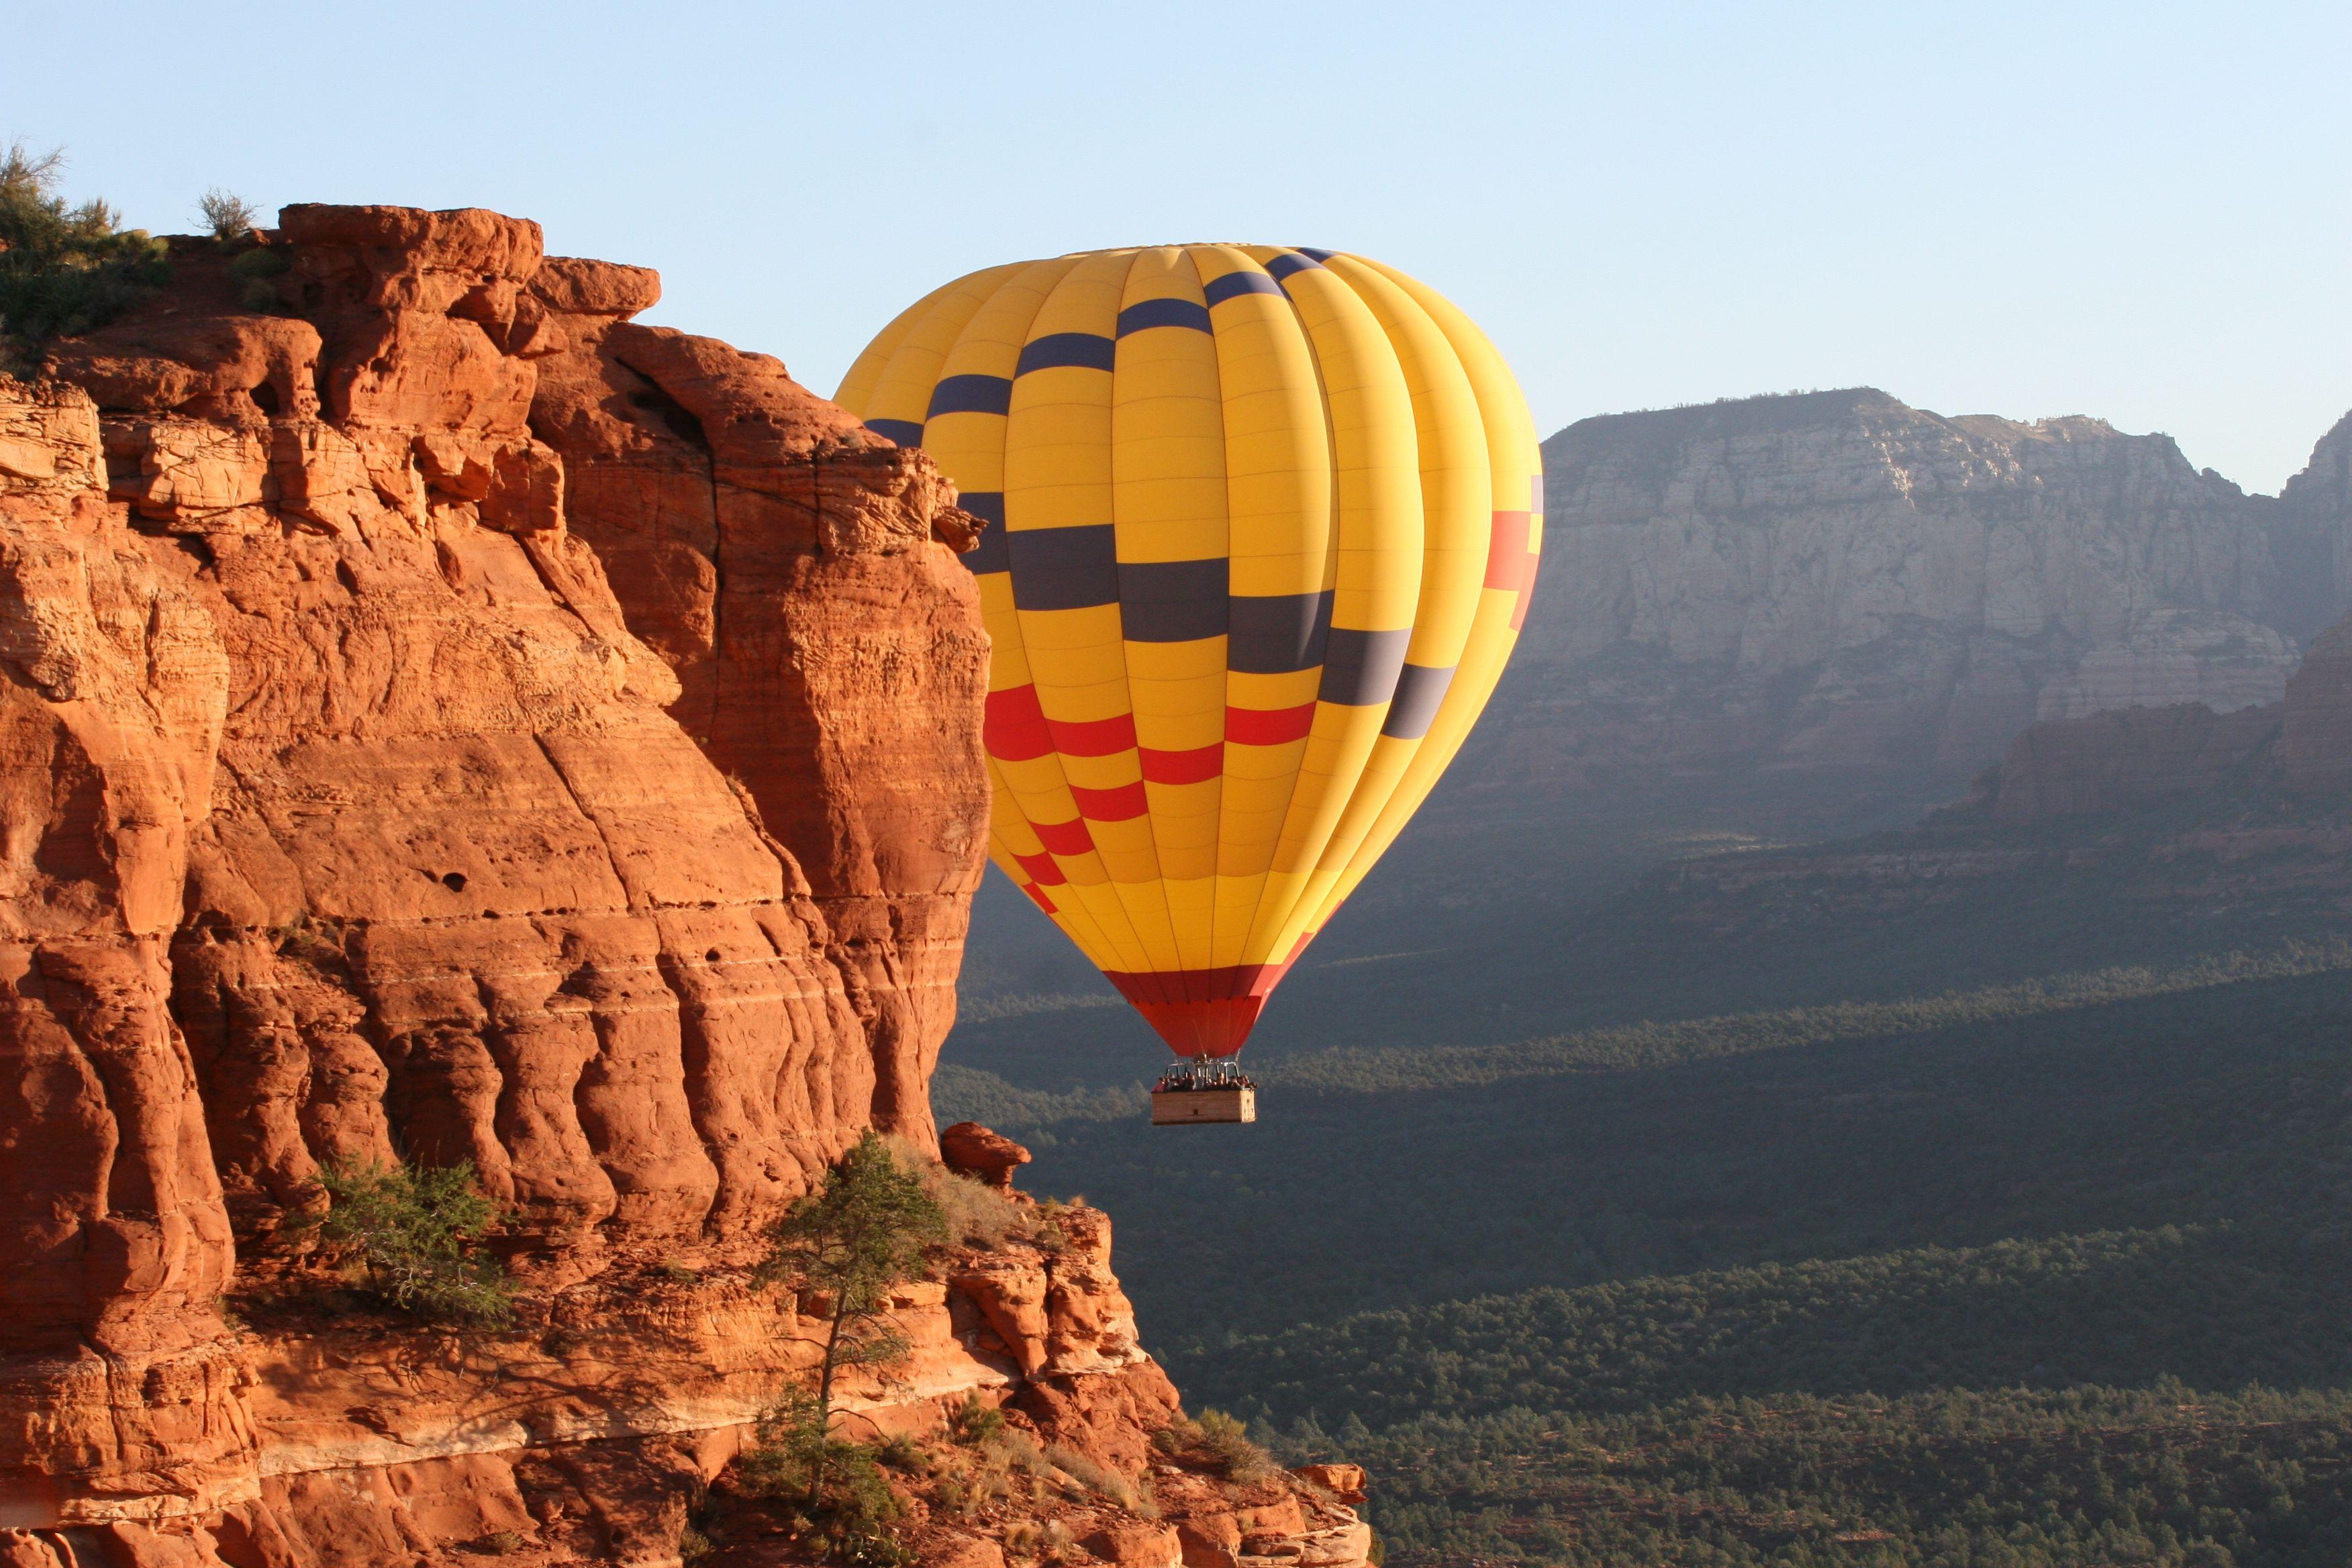 Hot Air Balloon ride in Sedonawe did this a few years ago